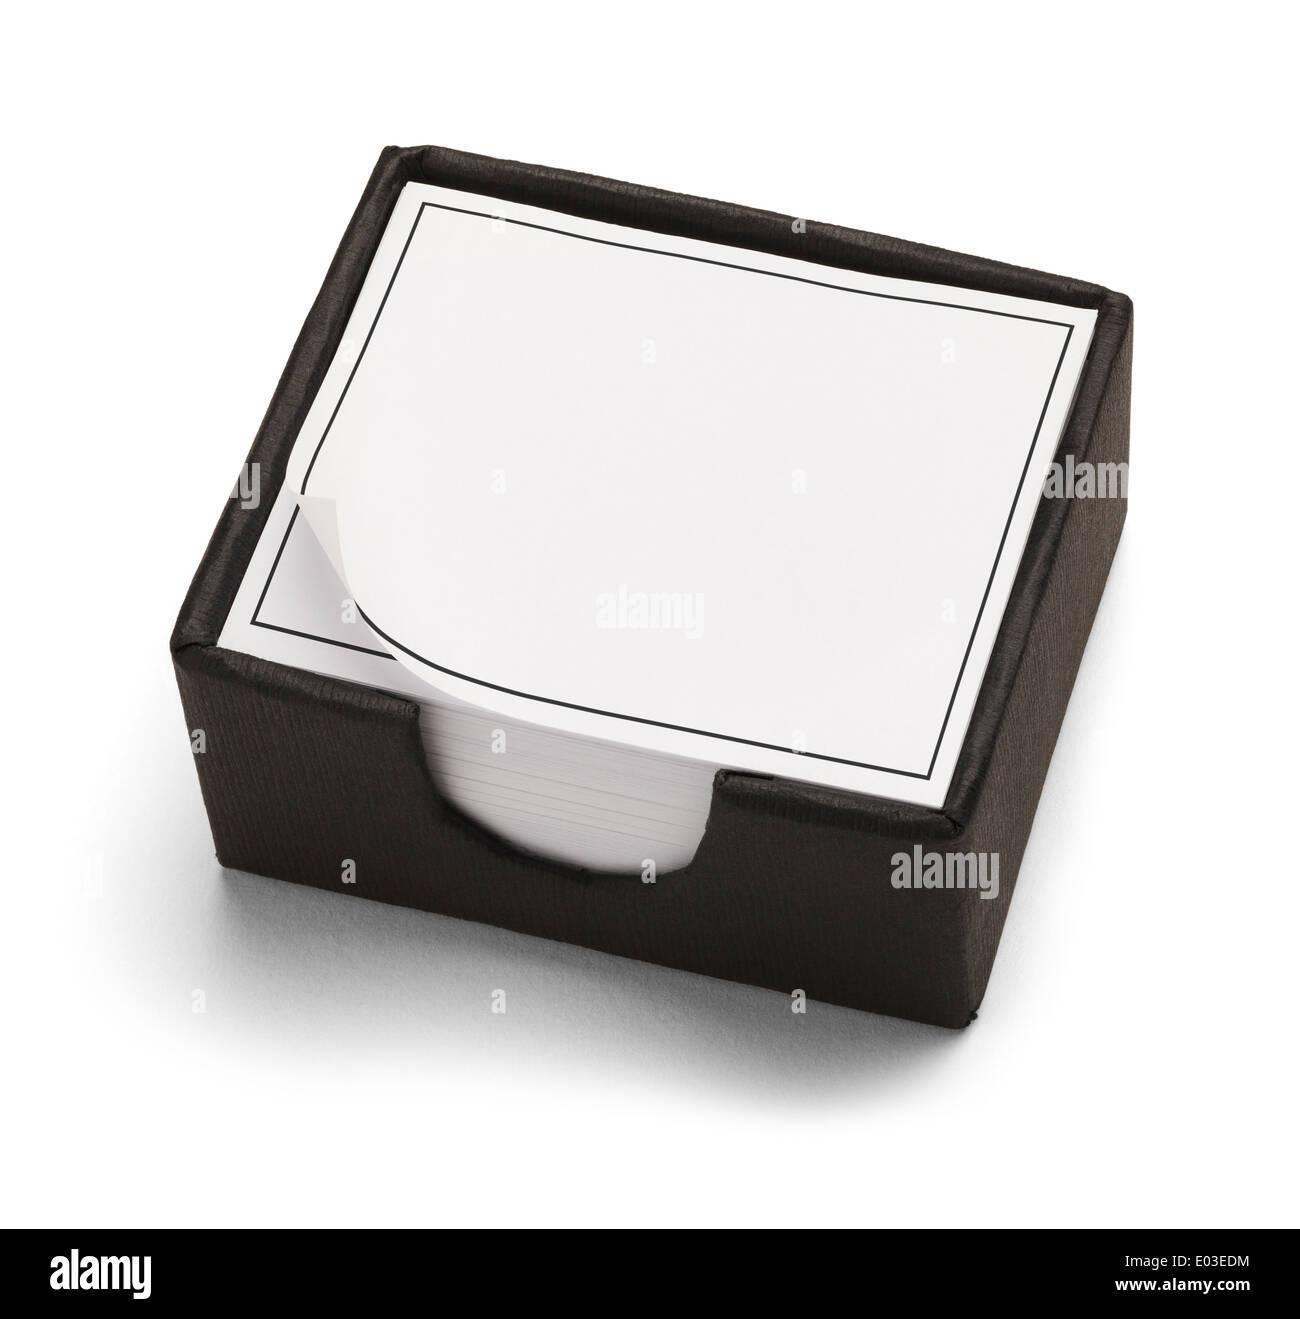 Black and White Desk Box Calendar Isolated on White Background. - Stock Image